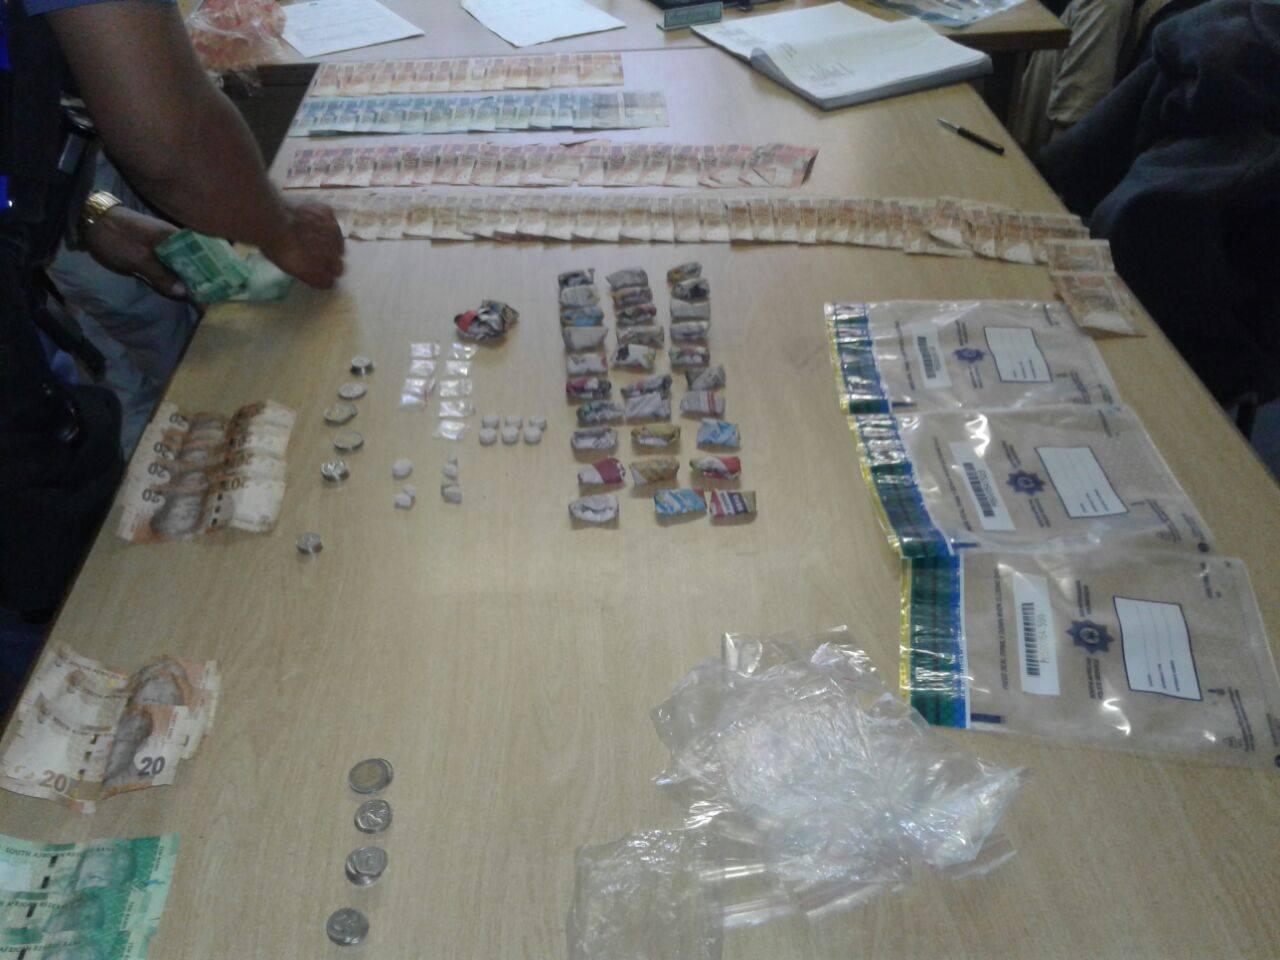 Drug dealing suspects arrested in the Bethelsdorp area